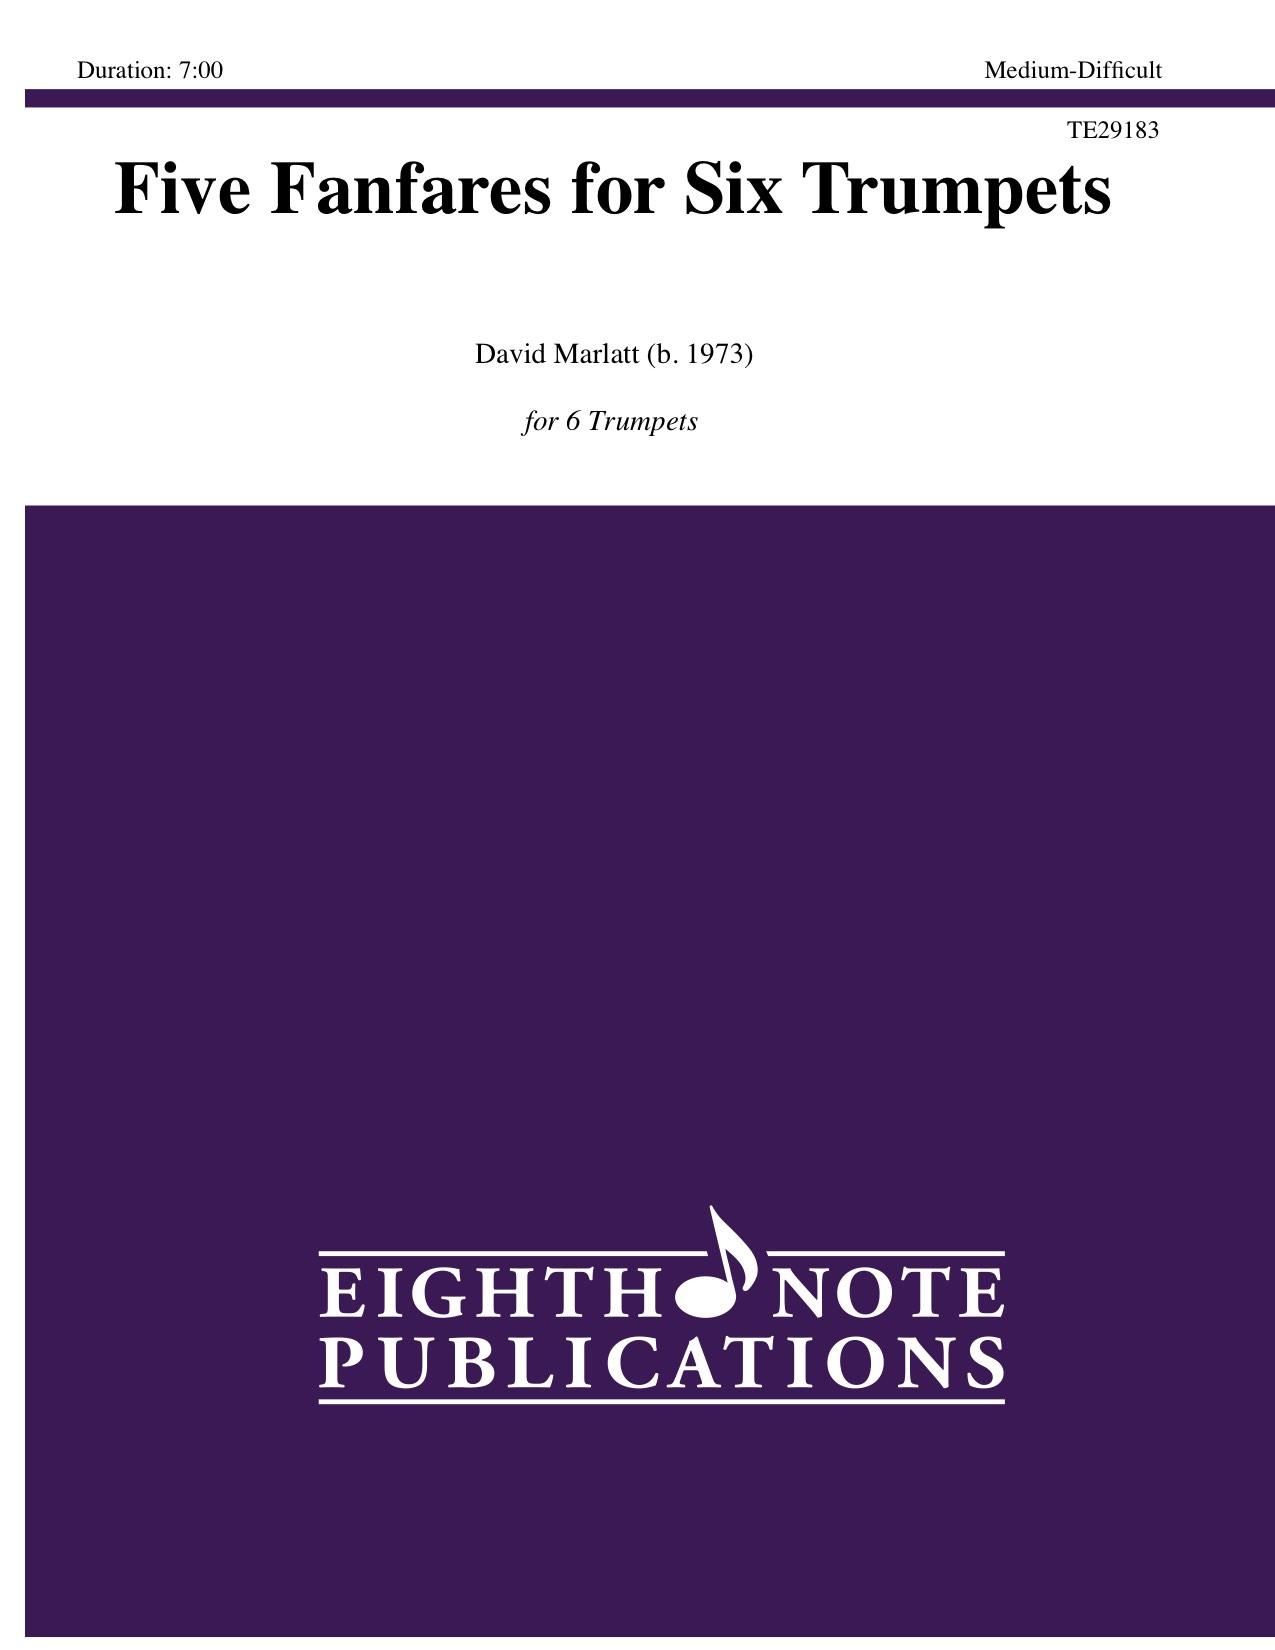 Five Fanfares for Six Trumpets - David Marlatt